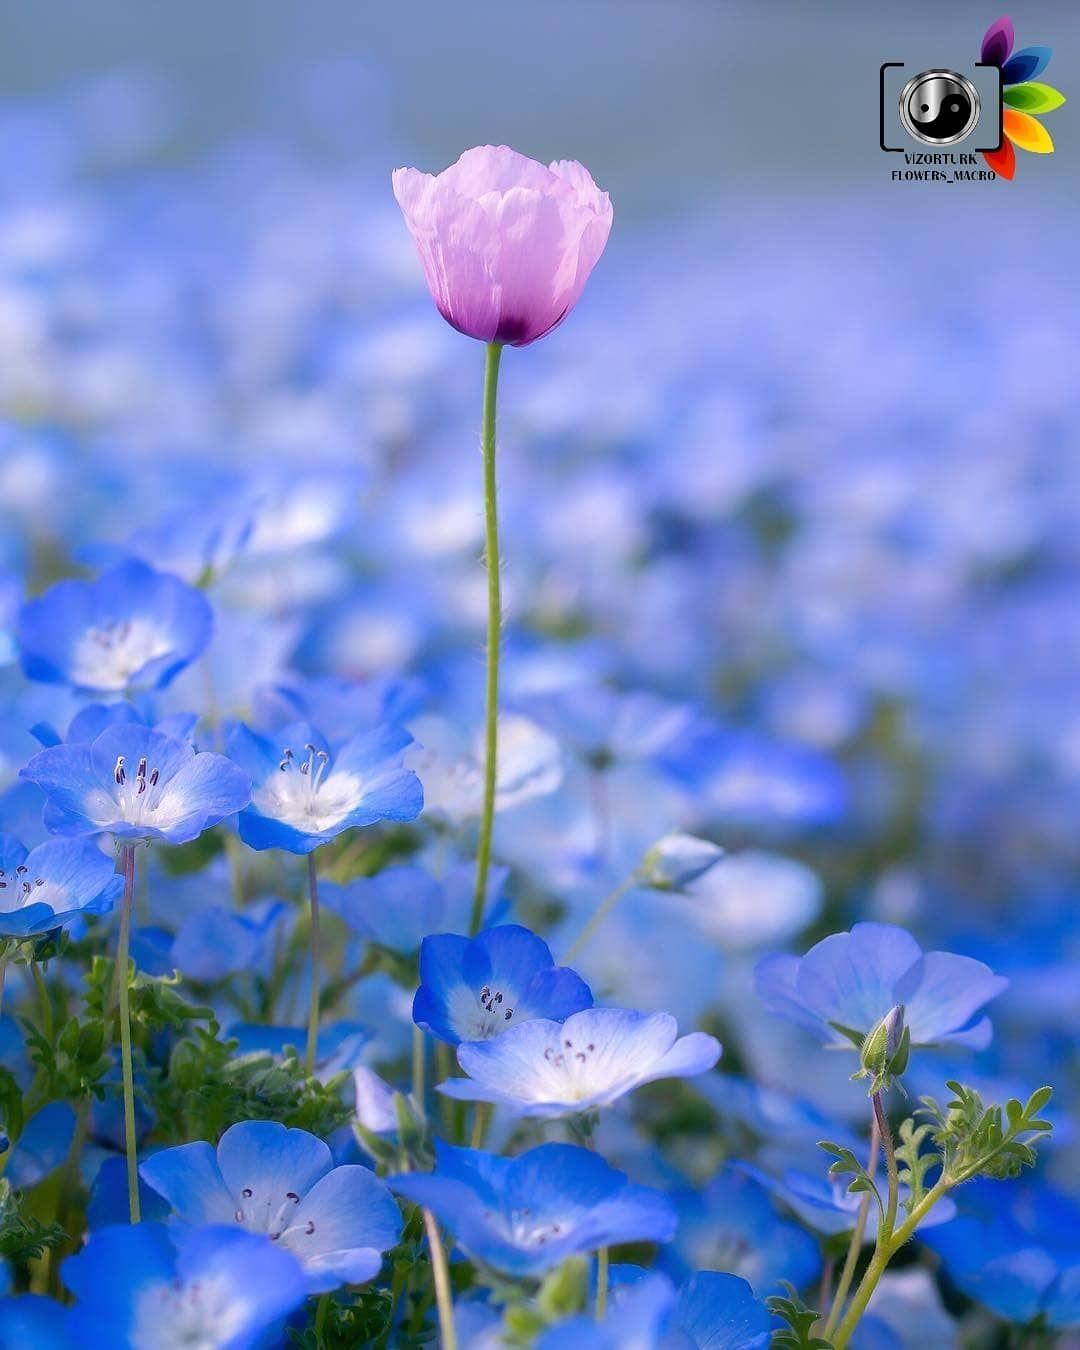 Congratulations Tebrikler PhotobyFotograf @astrailor_jp SeçimSelected by@bhrtunc lütfen bizi takip edin @vizorturk_flower_macro lütfen tagımızı kullanın #vizorturk_flower_macro KARDEŞ SAYFALARIMIZ @vizorturk_hdr @vizorturk_best @vizorturk_dream @vizorturkiyem #flower_igers #flowers_mania__ #flowersandmacro #turklikeben_macro #macro_turkey #ir_flowers_macro #kings_macro#macro_vision #bns_macro #funda_flowers #flowers_super_pics #turkobjektif_macro #flowers_world26 #flowerschannel #flowers_andlife